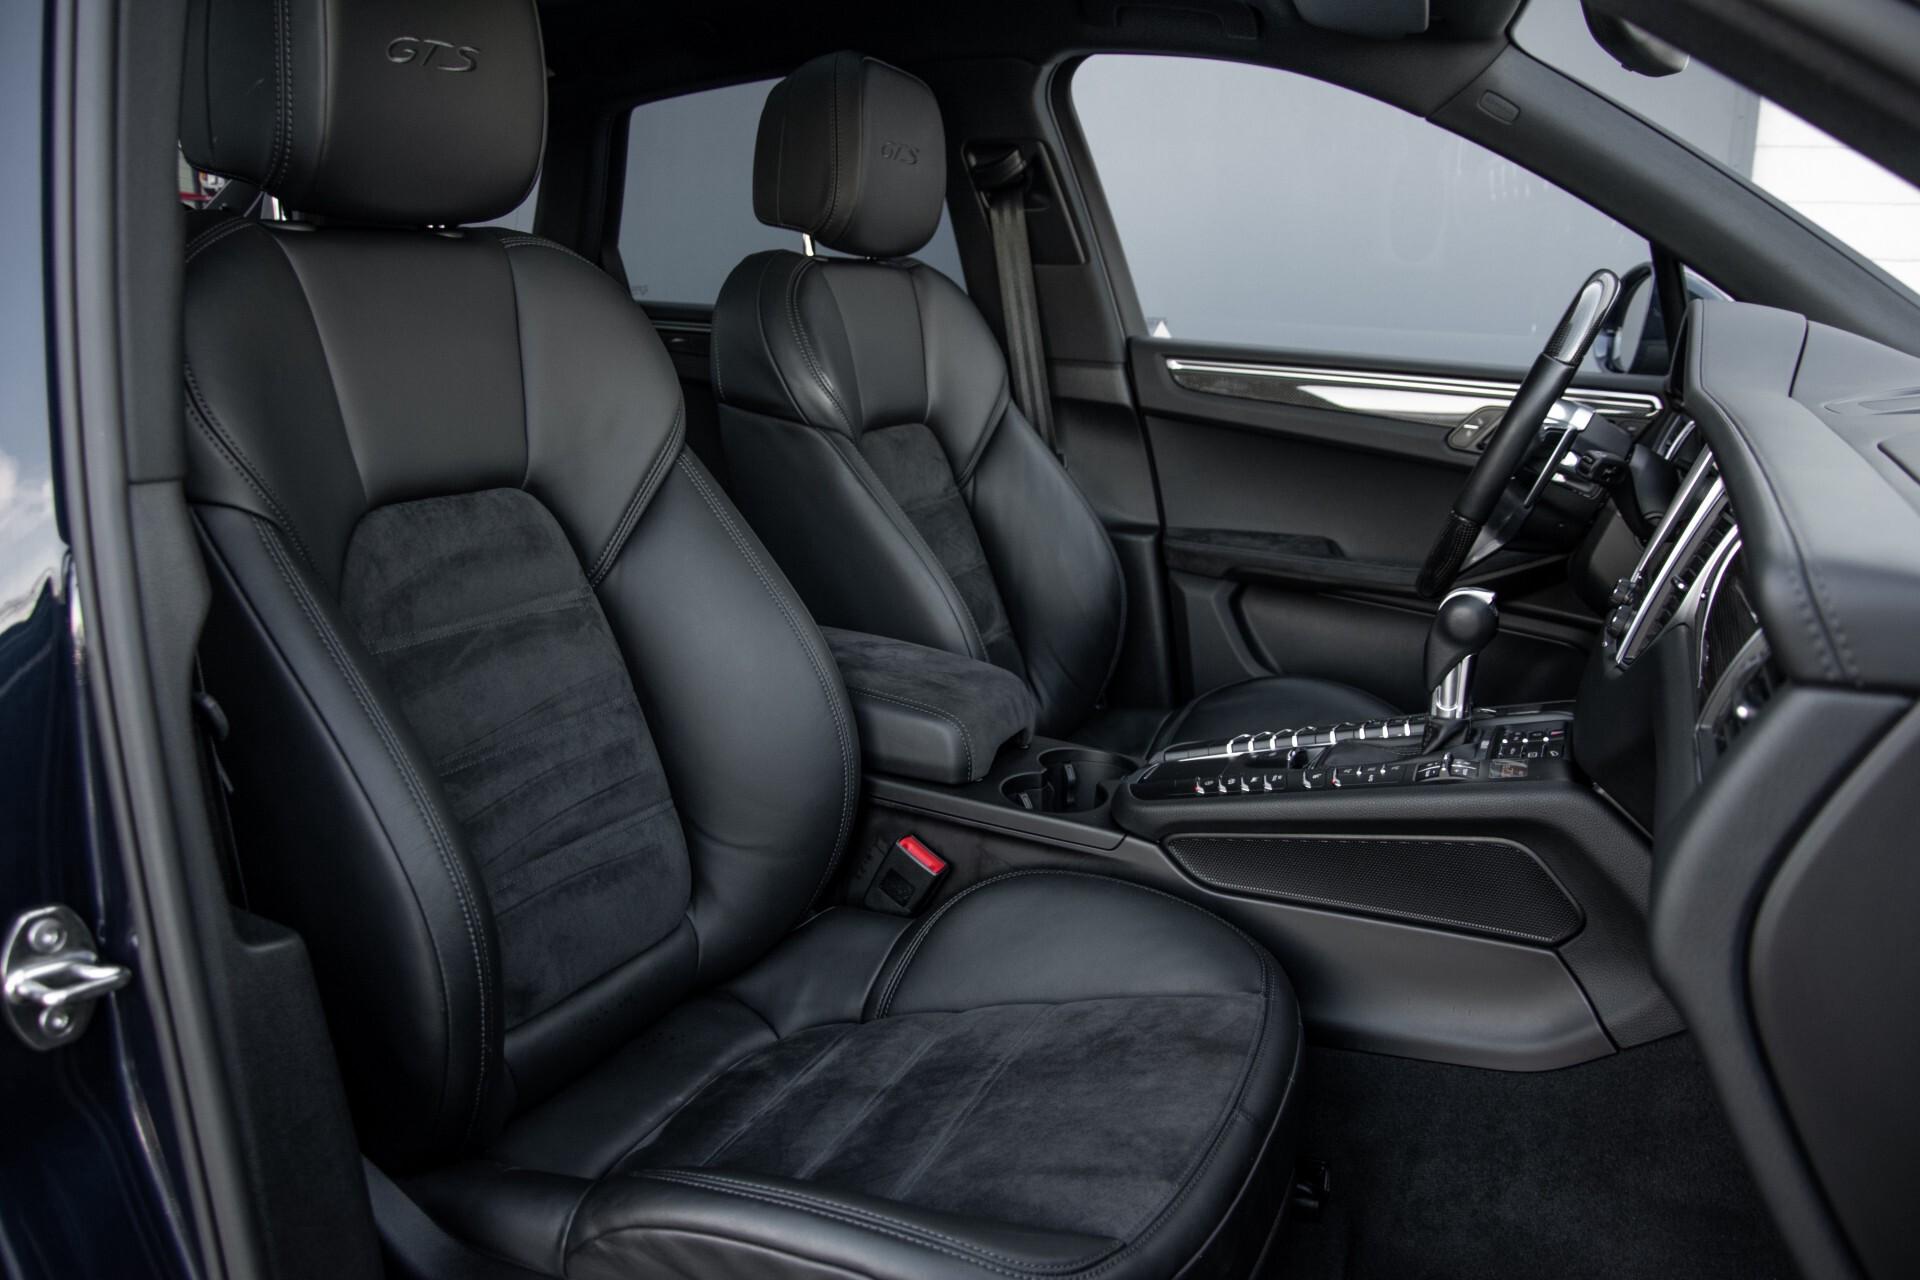 Porsche Macan 3.0 GTS Luchtvering/Panorama/Carbon/Bose/360-camera/Memory/PDLS Aut7 Foto 3